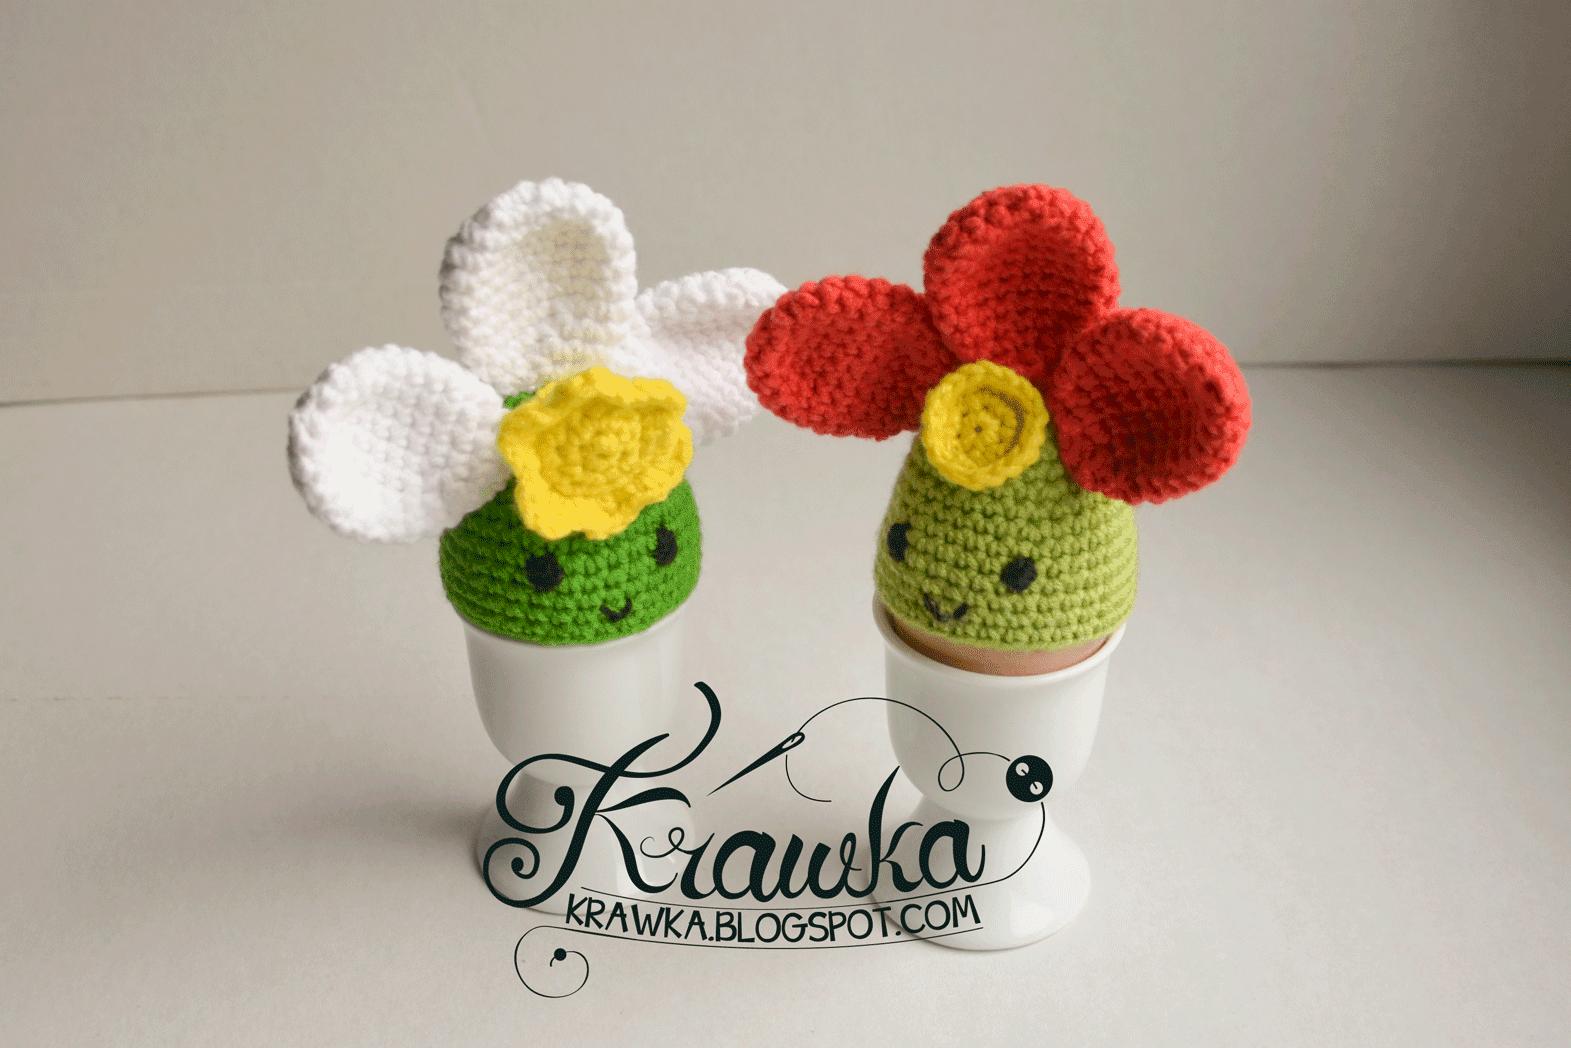 Krawka: Spring flower - Easter egg cozies - Free crochet Pattern to make it yourself